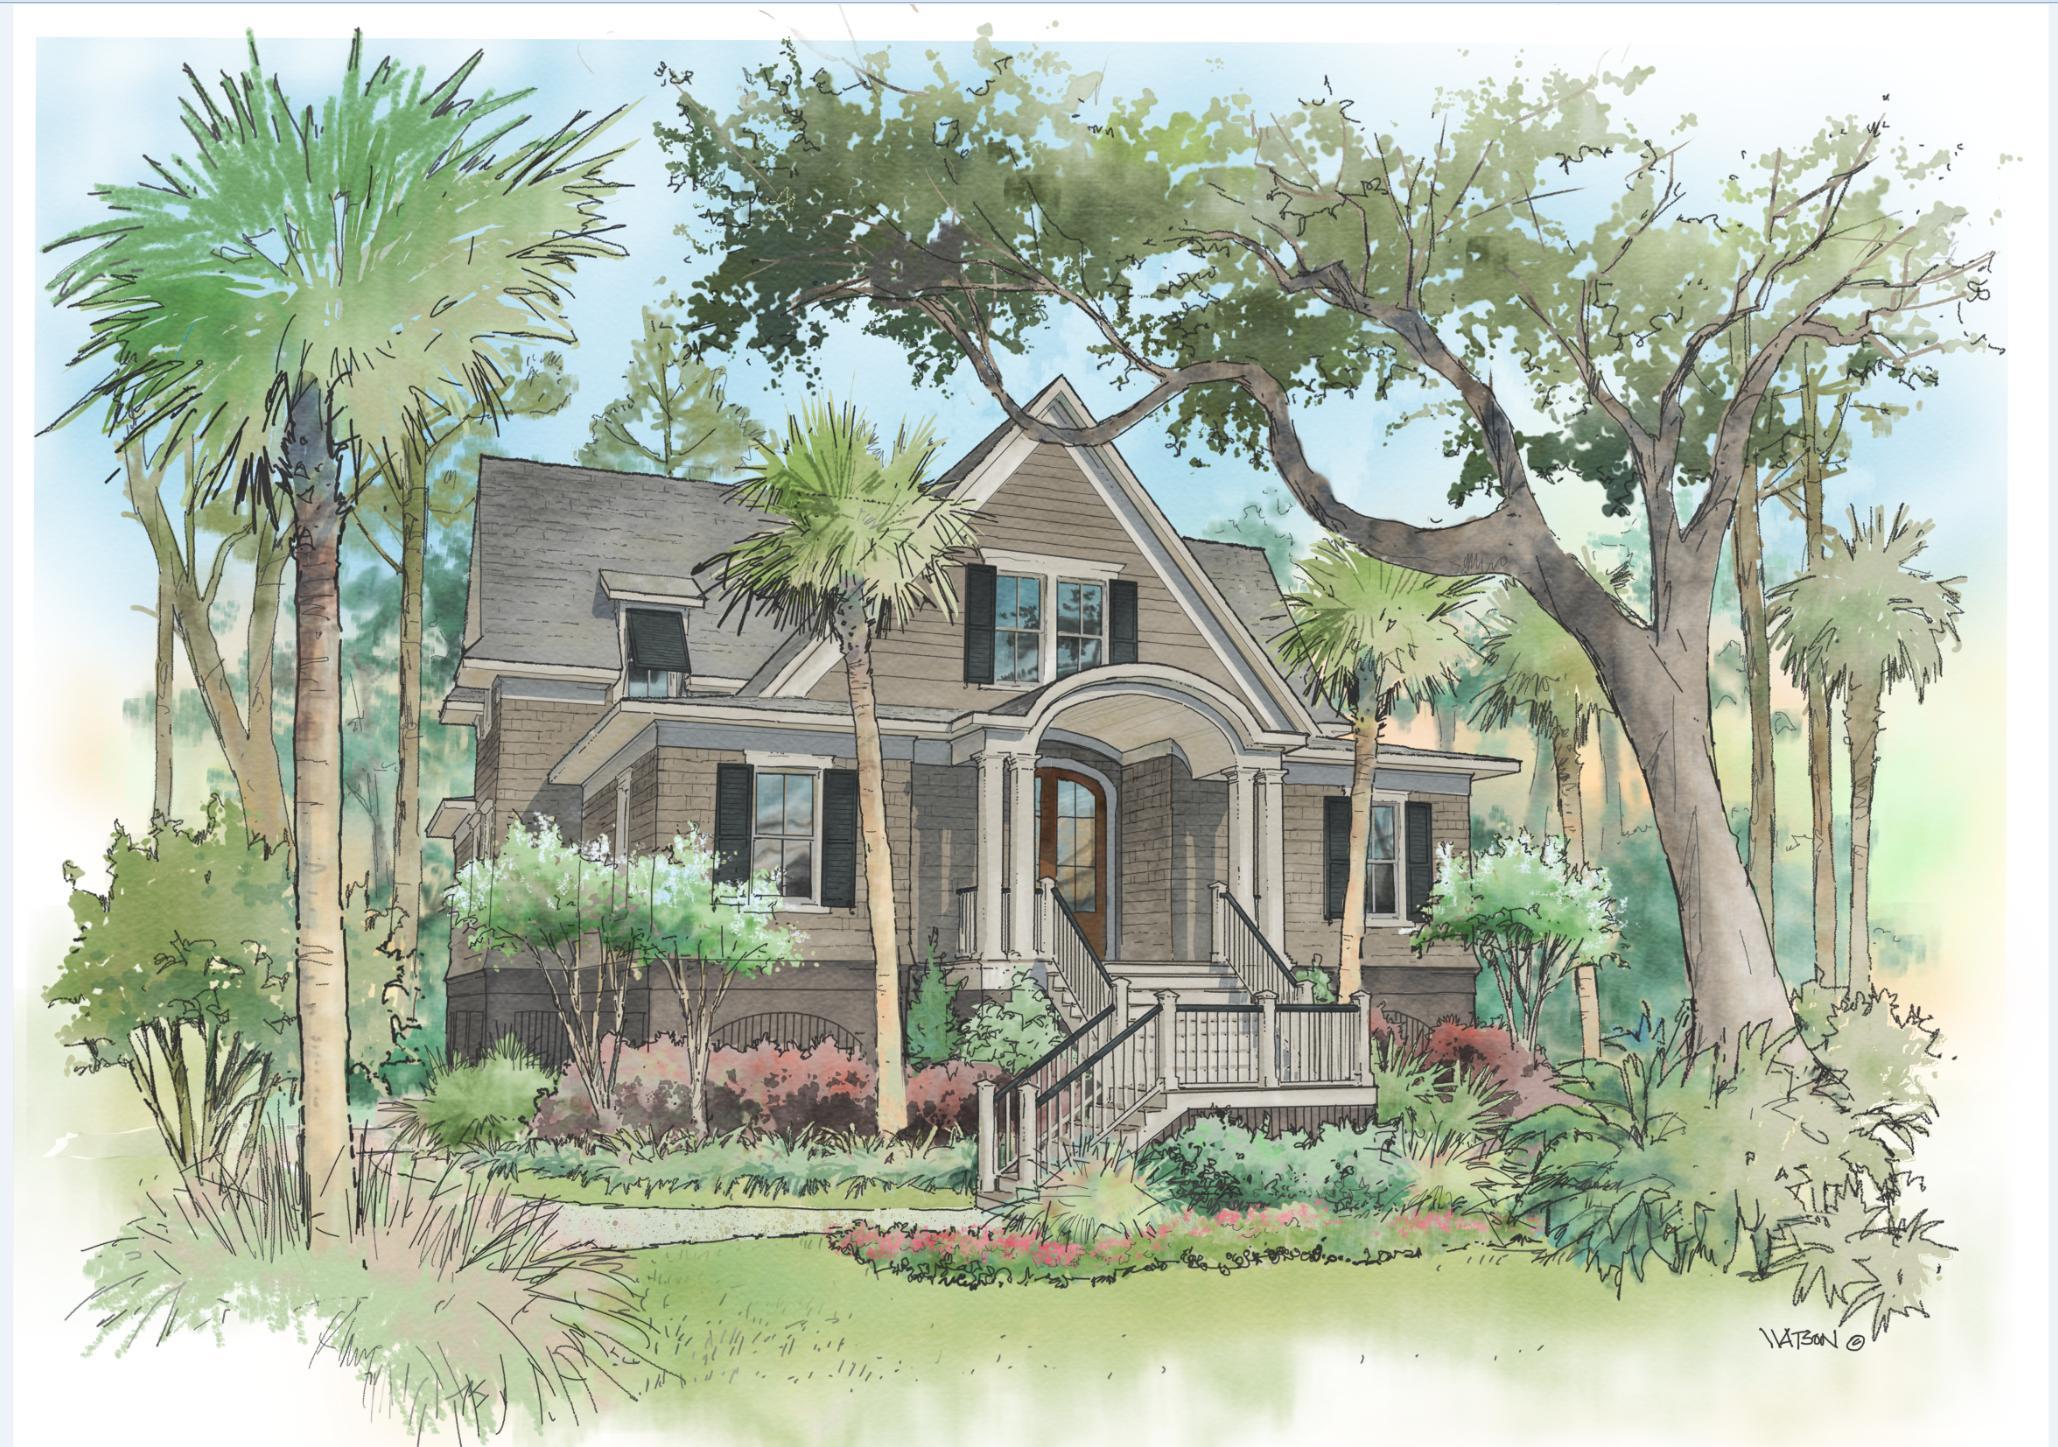 Seabrook Island Homes For Sale - 2856 Captain Sams, Seabrook Island, SC - 42